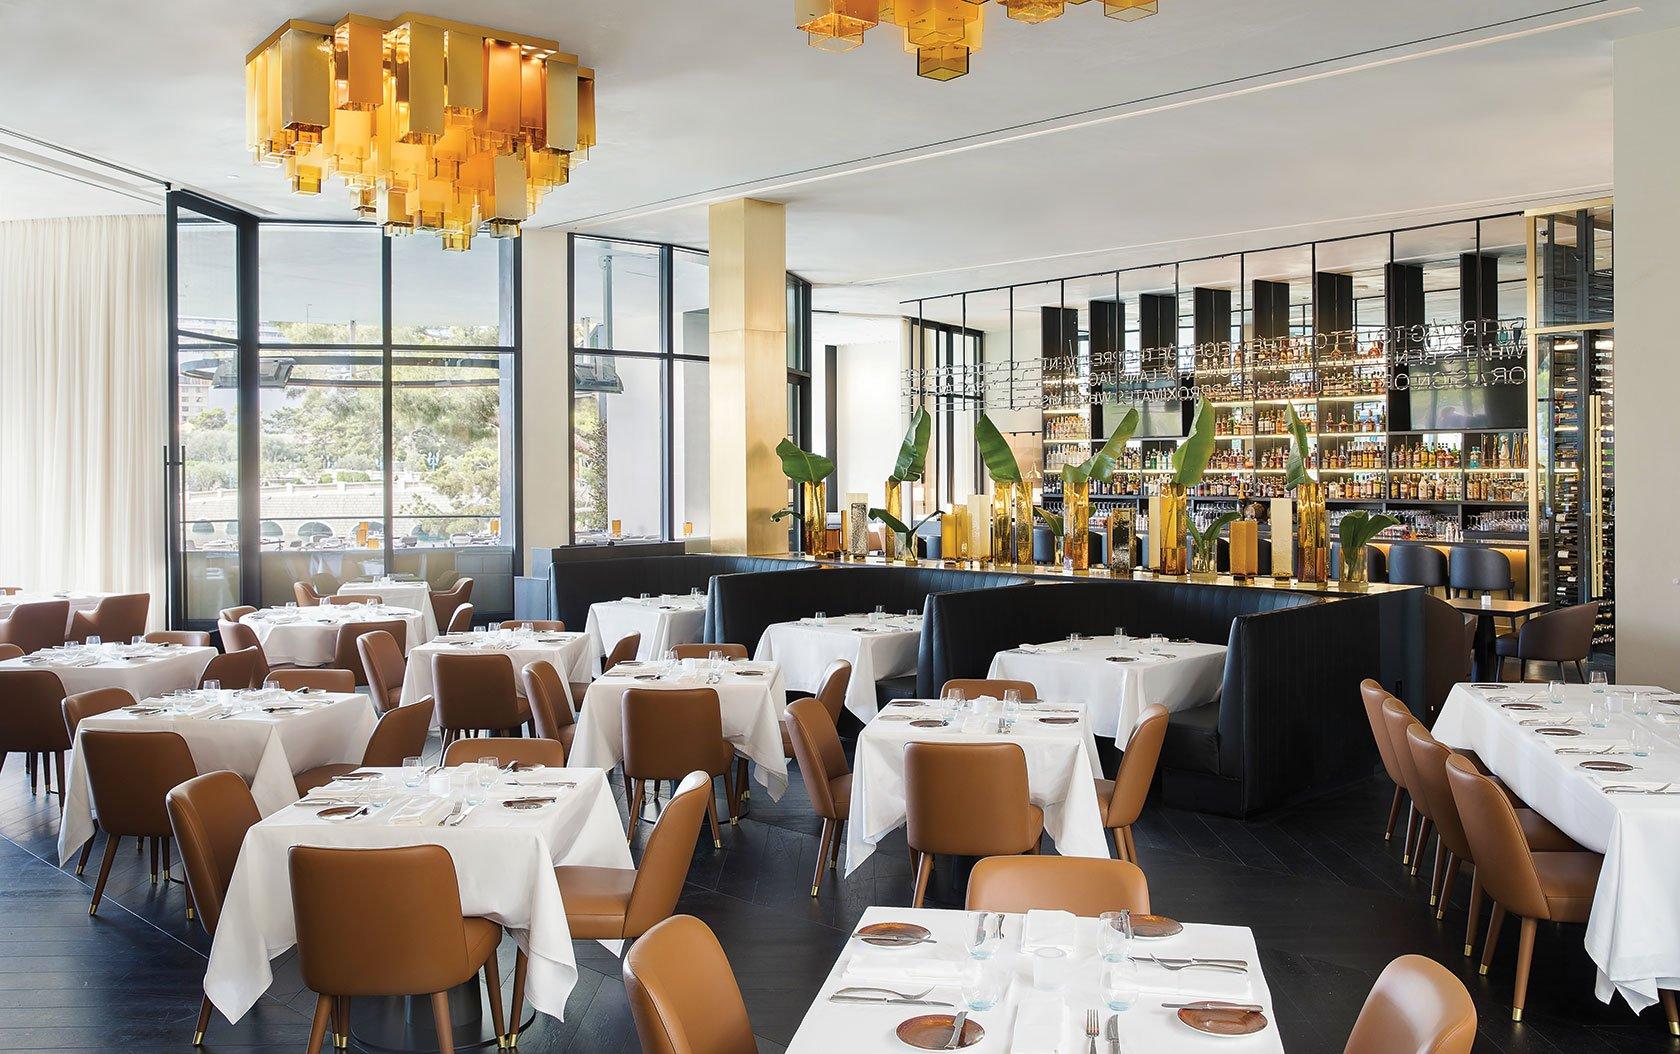 Spago Restaurant, Bellagio Hotel